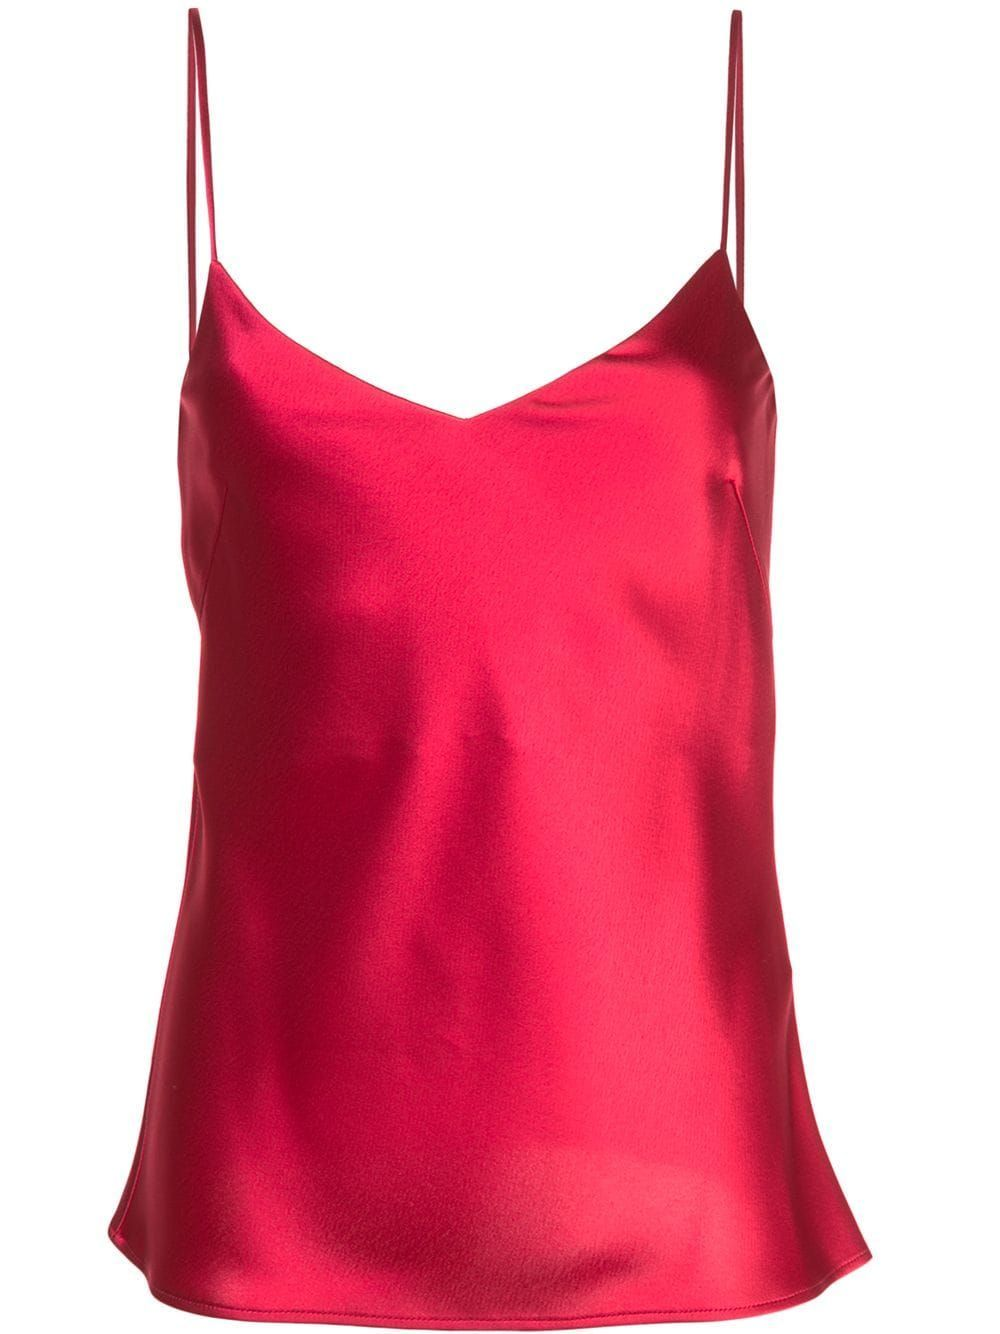 Raspbery Red Satin V-neck Camisole